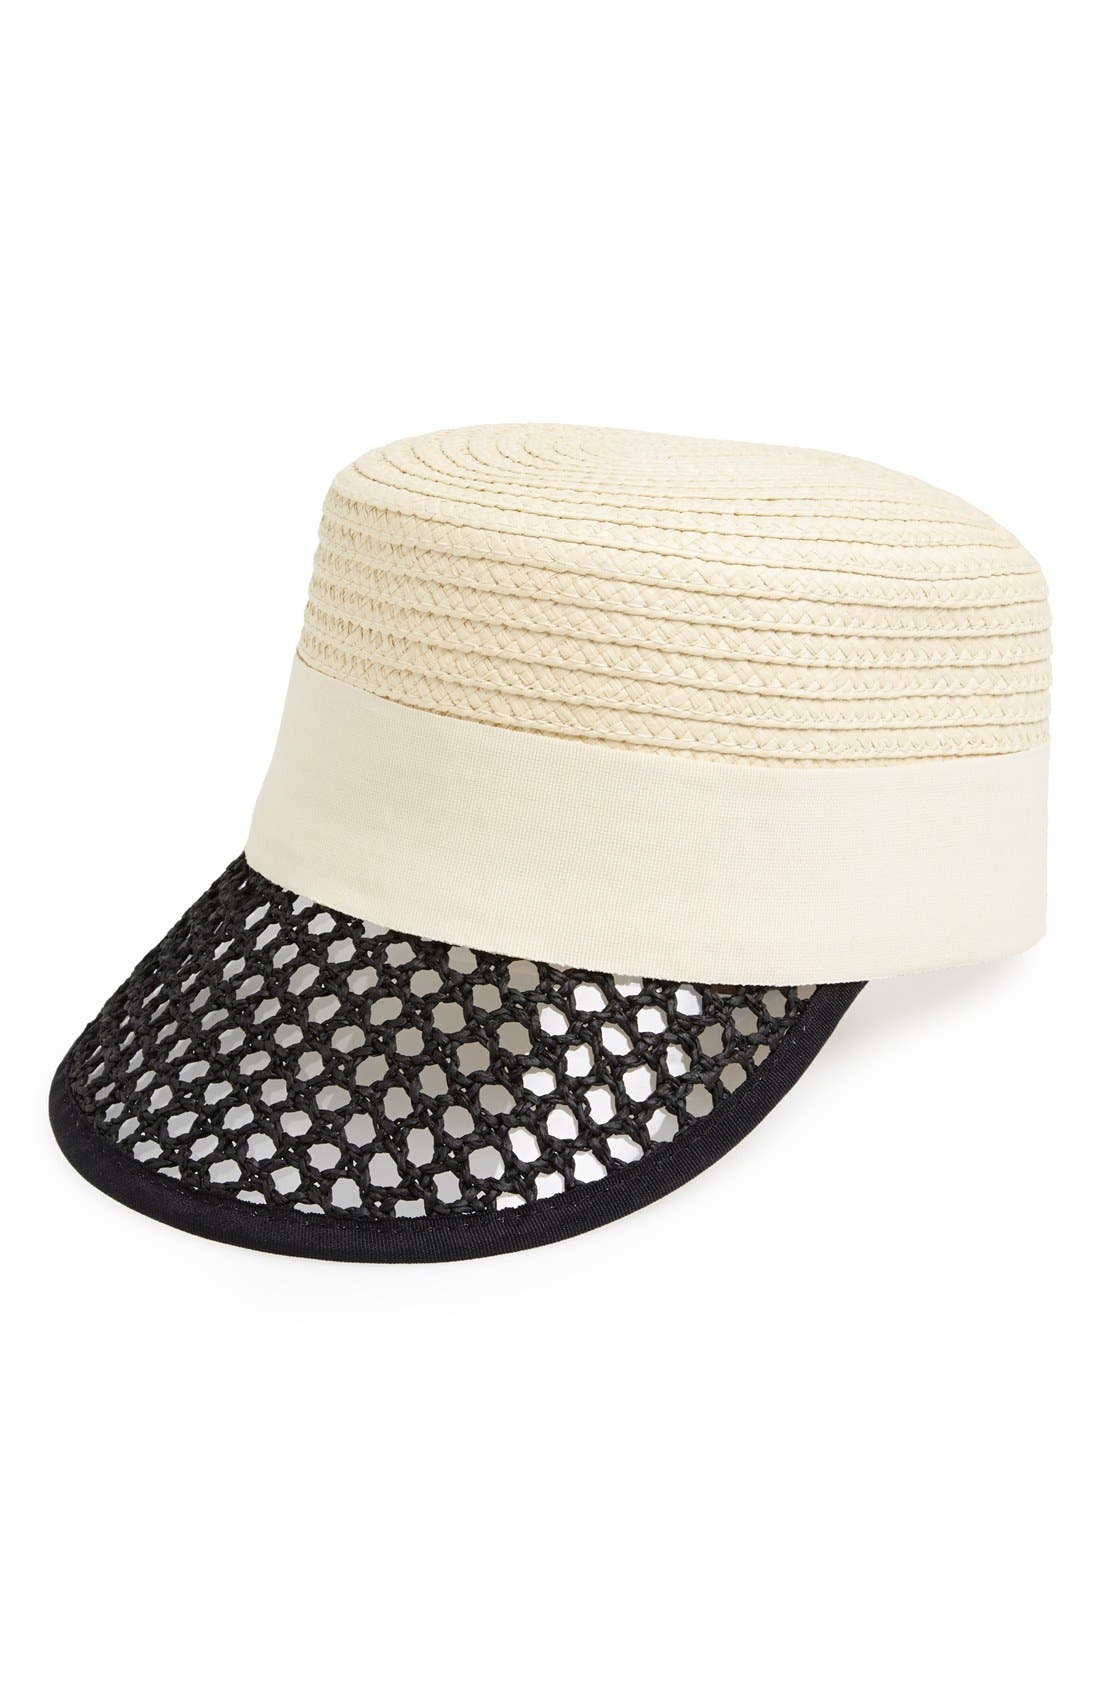 Main Image - August Hat Woven Cap